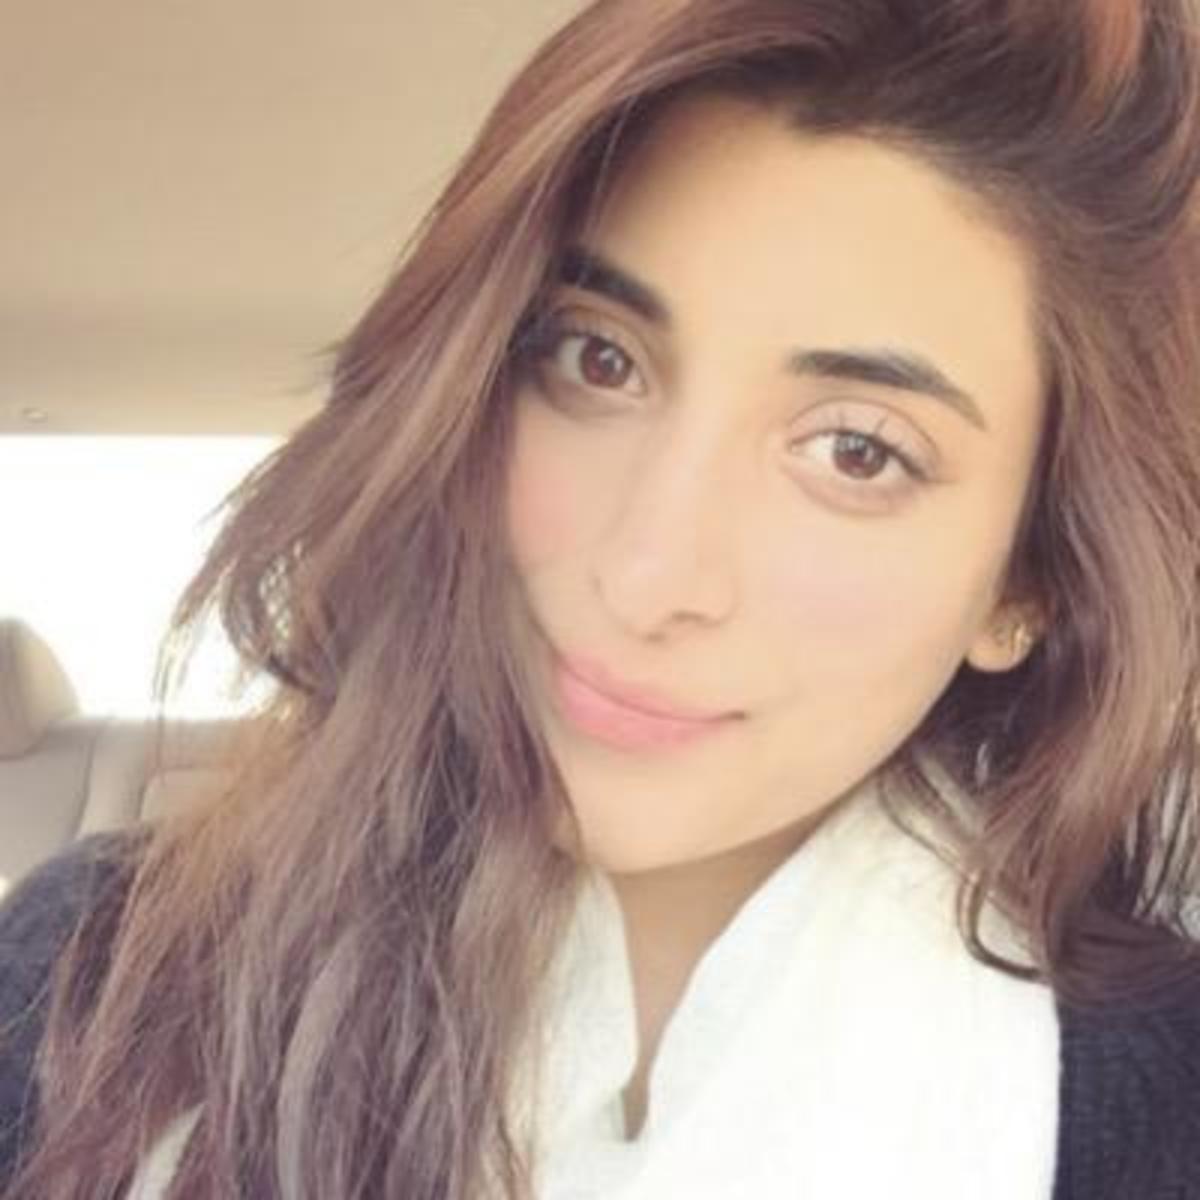 six-pakistani-actresses-who-look-beautiful-without-make-up